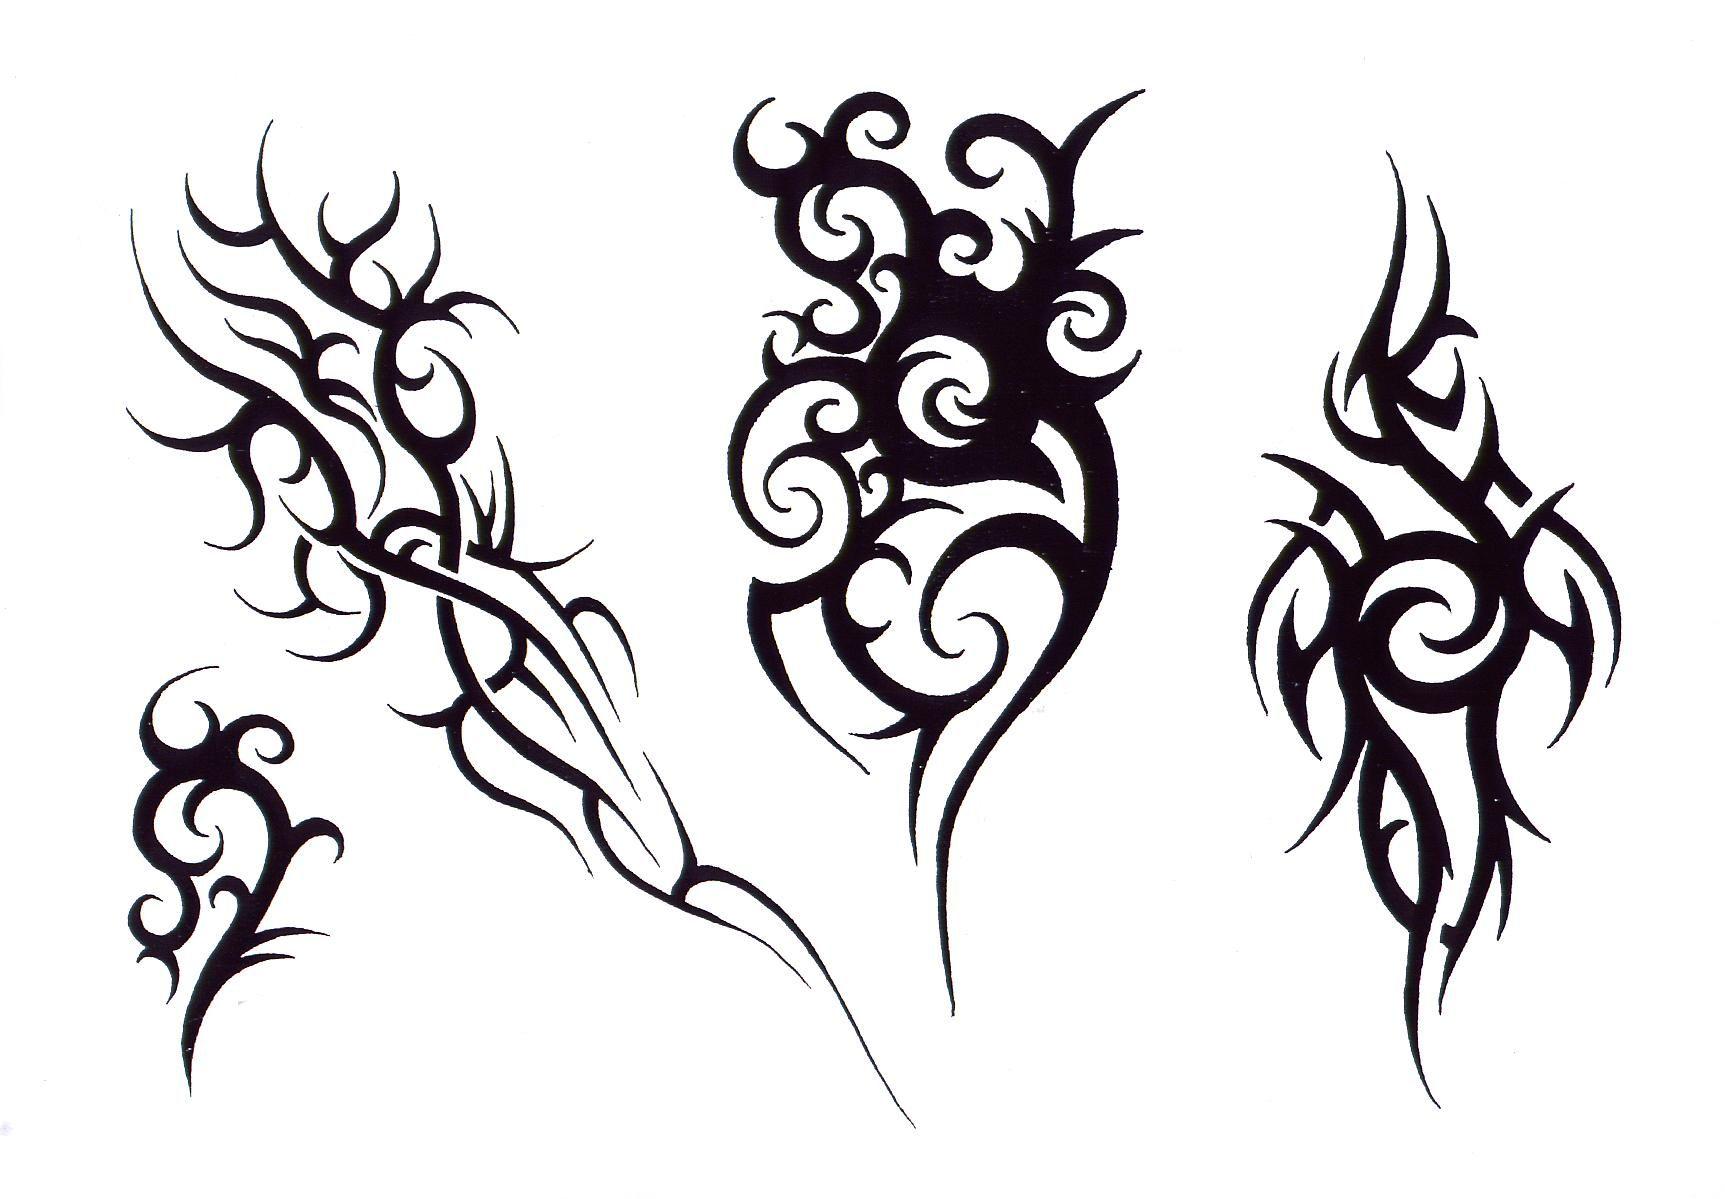 Tribal-Tattoos eff1be8044ba18dc03ab6a0c4988b70d